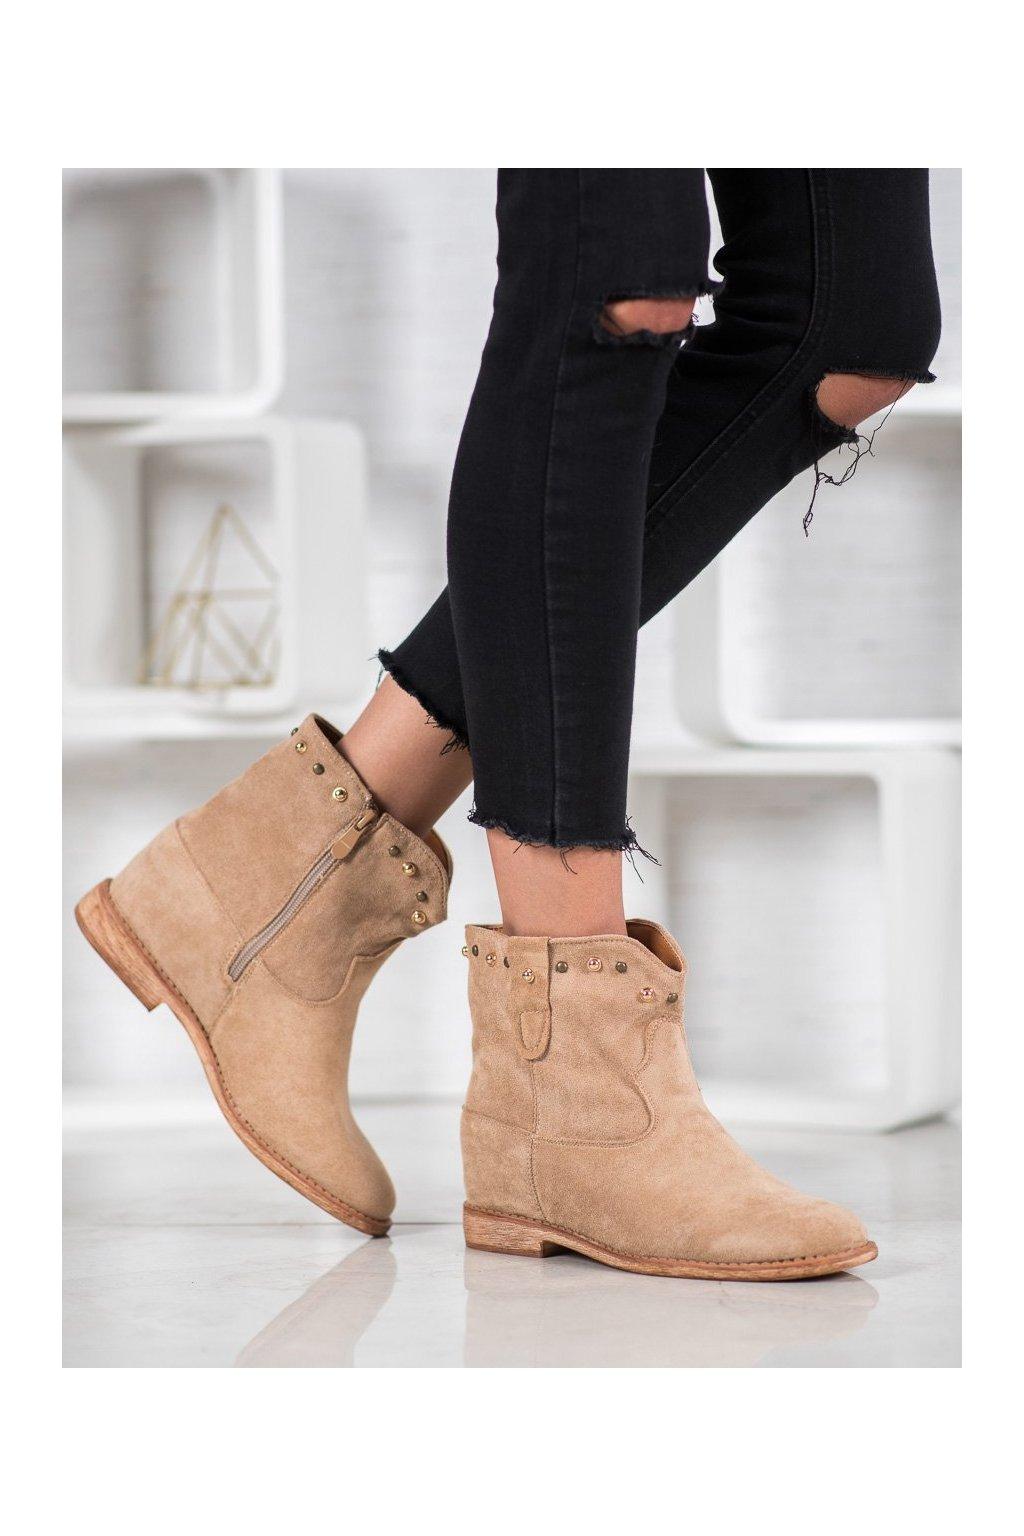 Hnedé dámske topánky Bella paris kod A3710KH